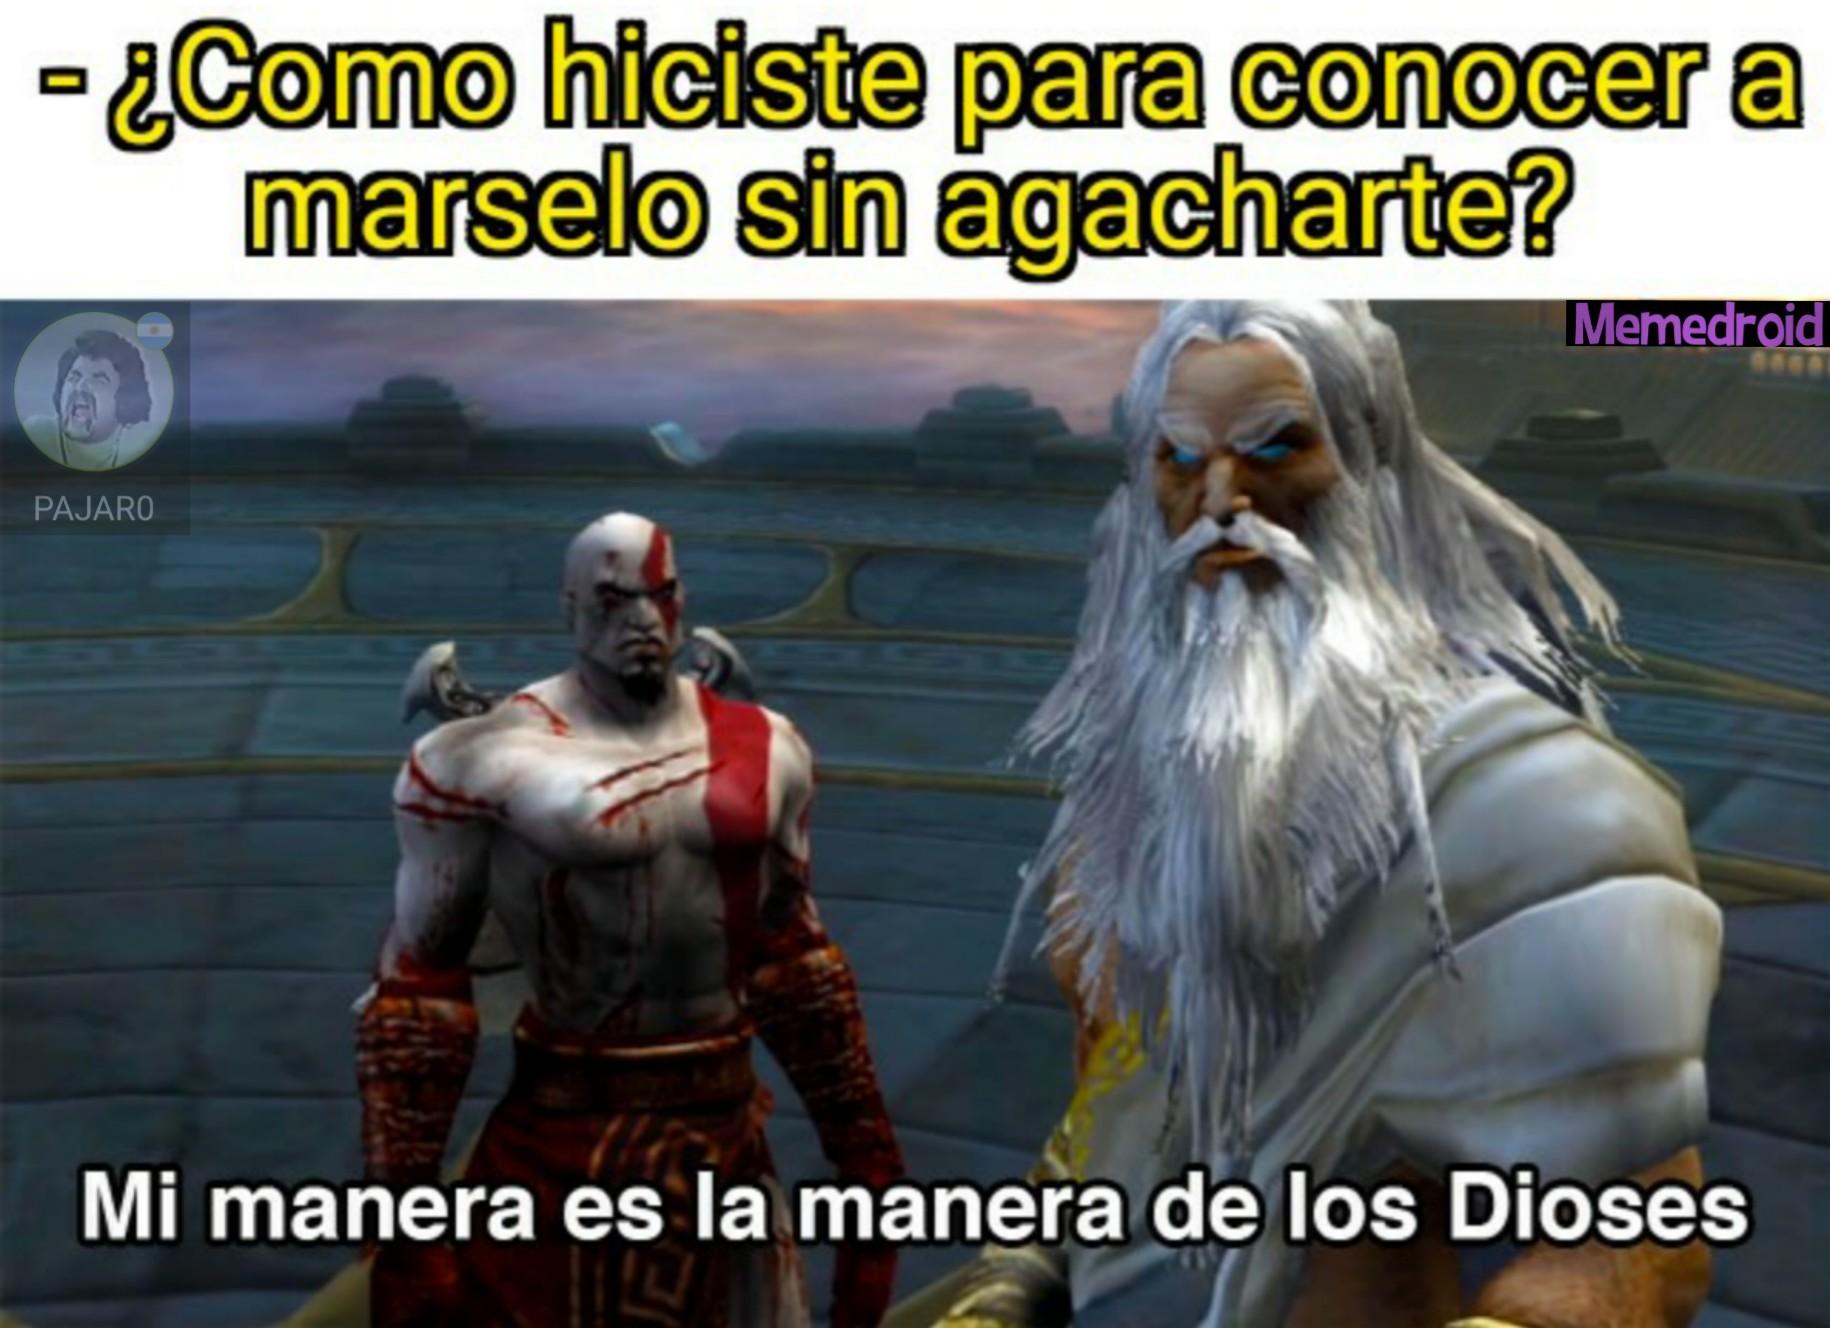 Meme 060